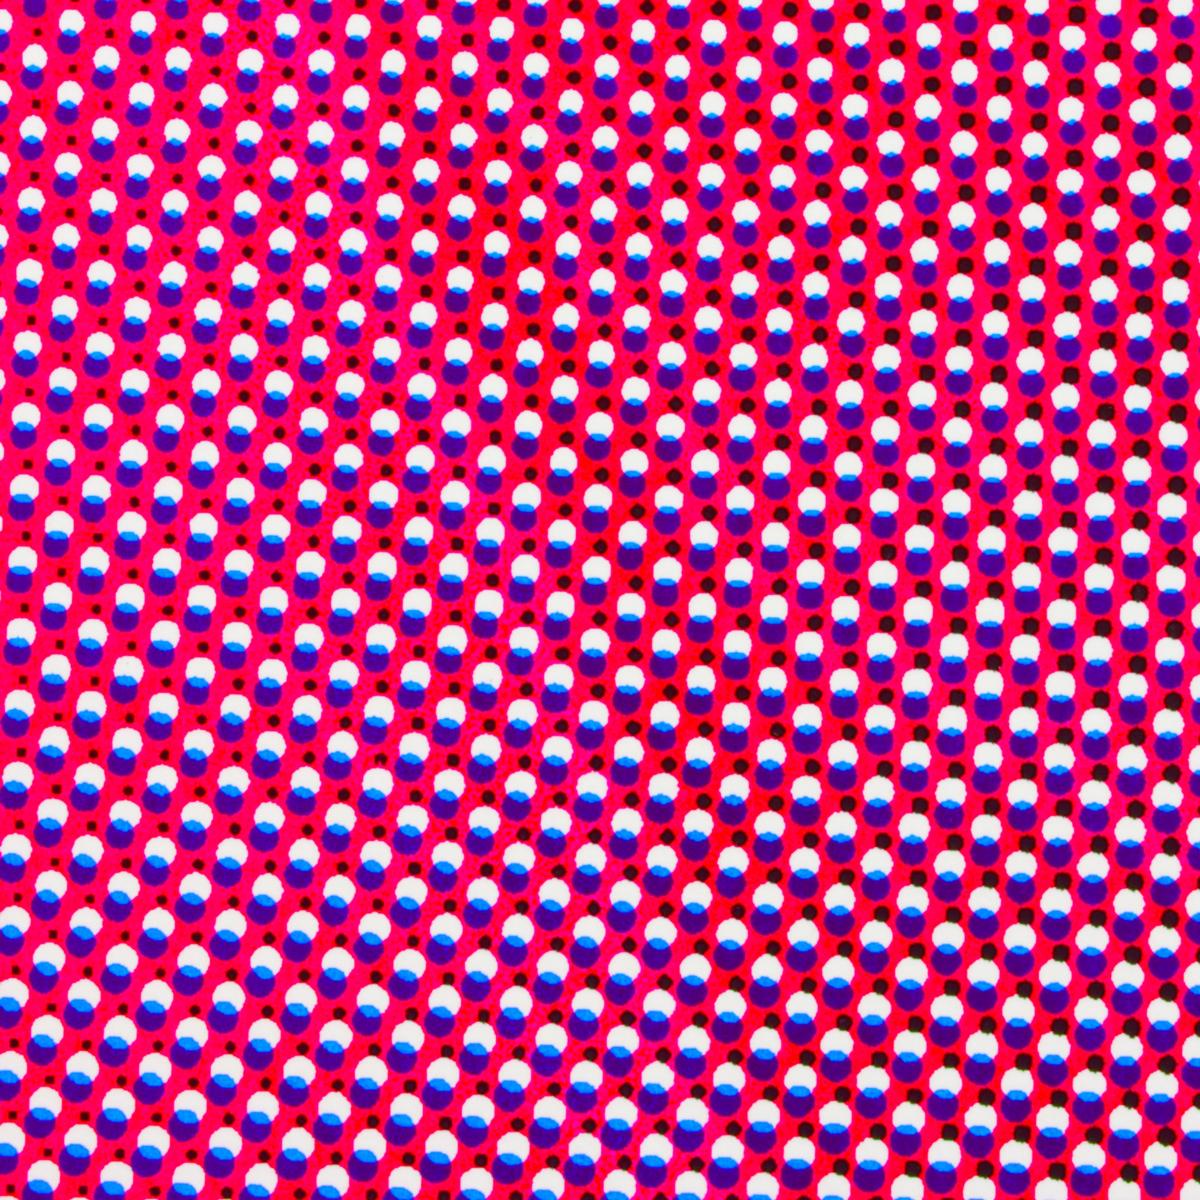 rogier-arents-new-window-gradient-close-up2-1200